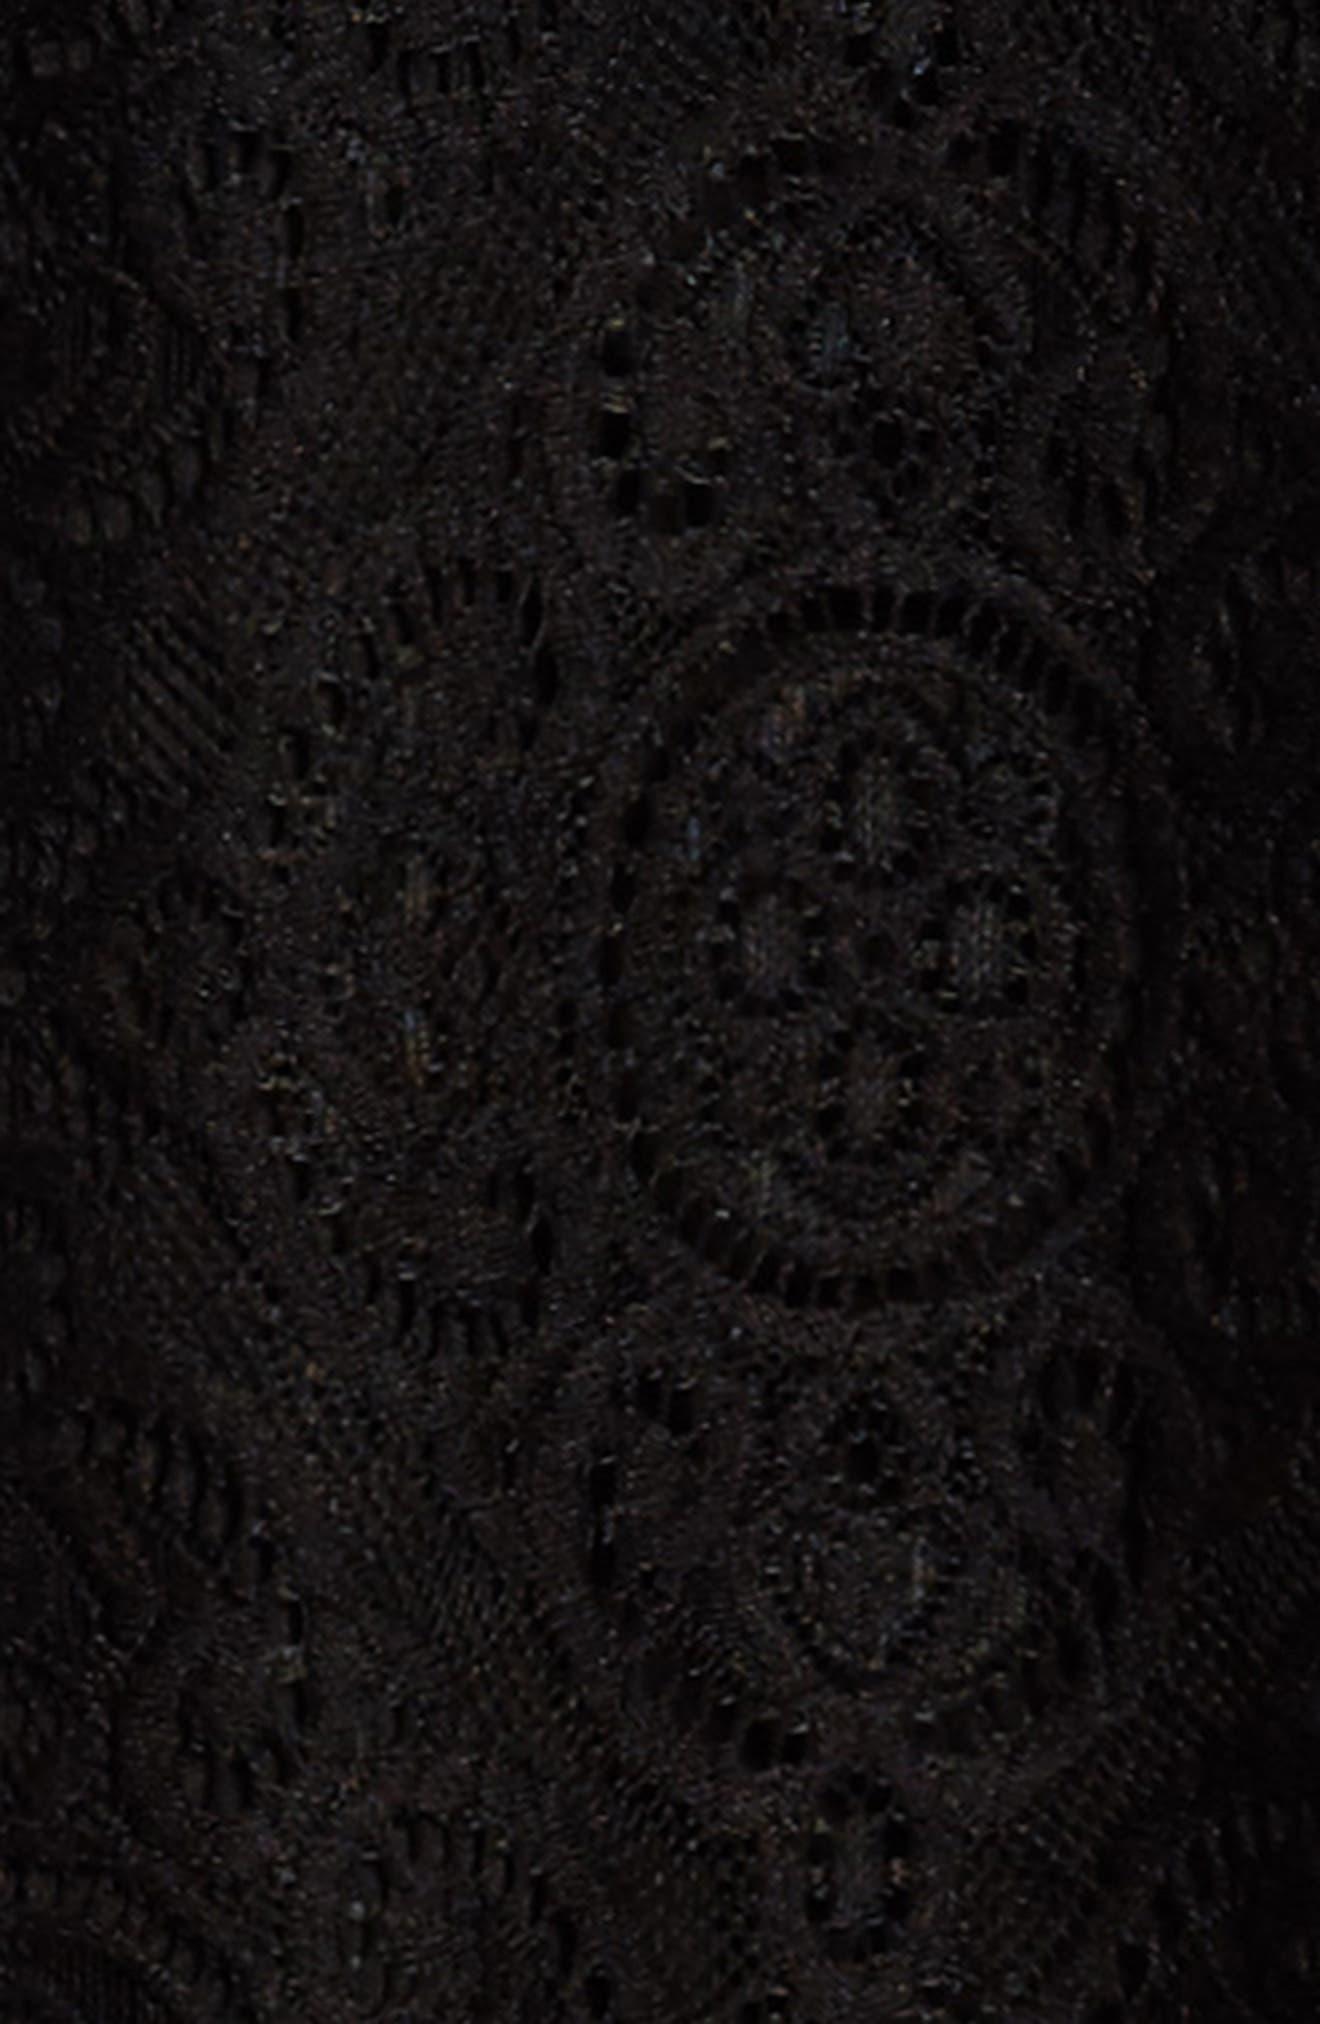 Lace Ruffle Cold Shoulder Dress,                             Alternate thumbnail 3, color,                             Black